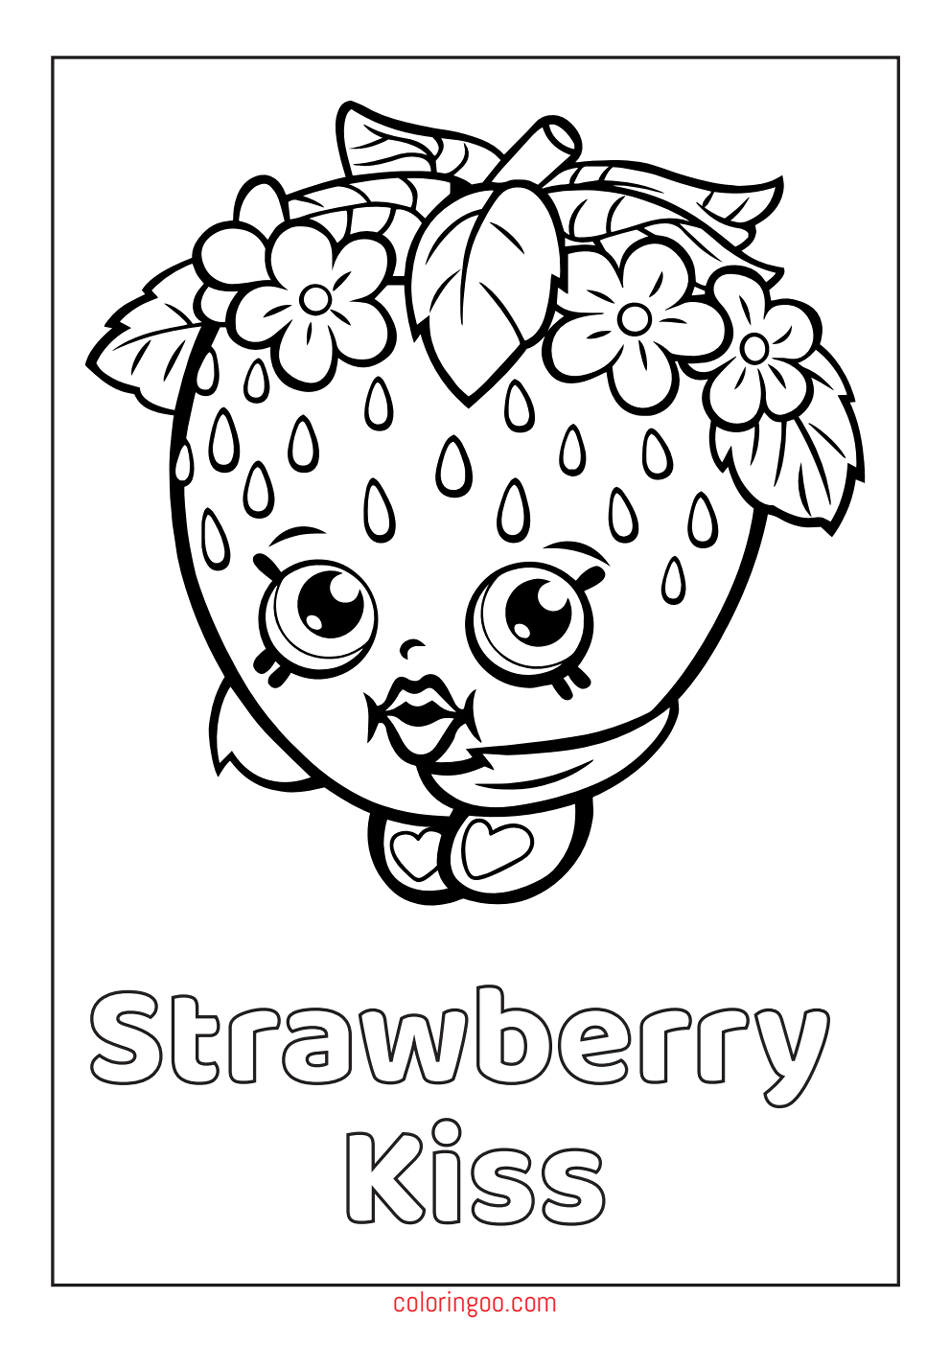 Printable Strawberry Kiss Shopkins PDF Coloring Pages